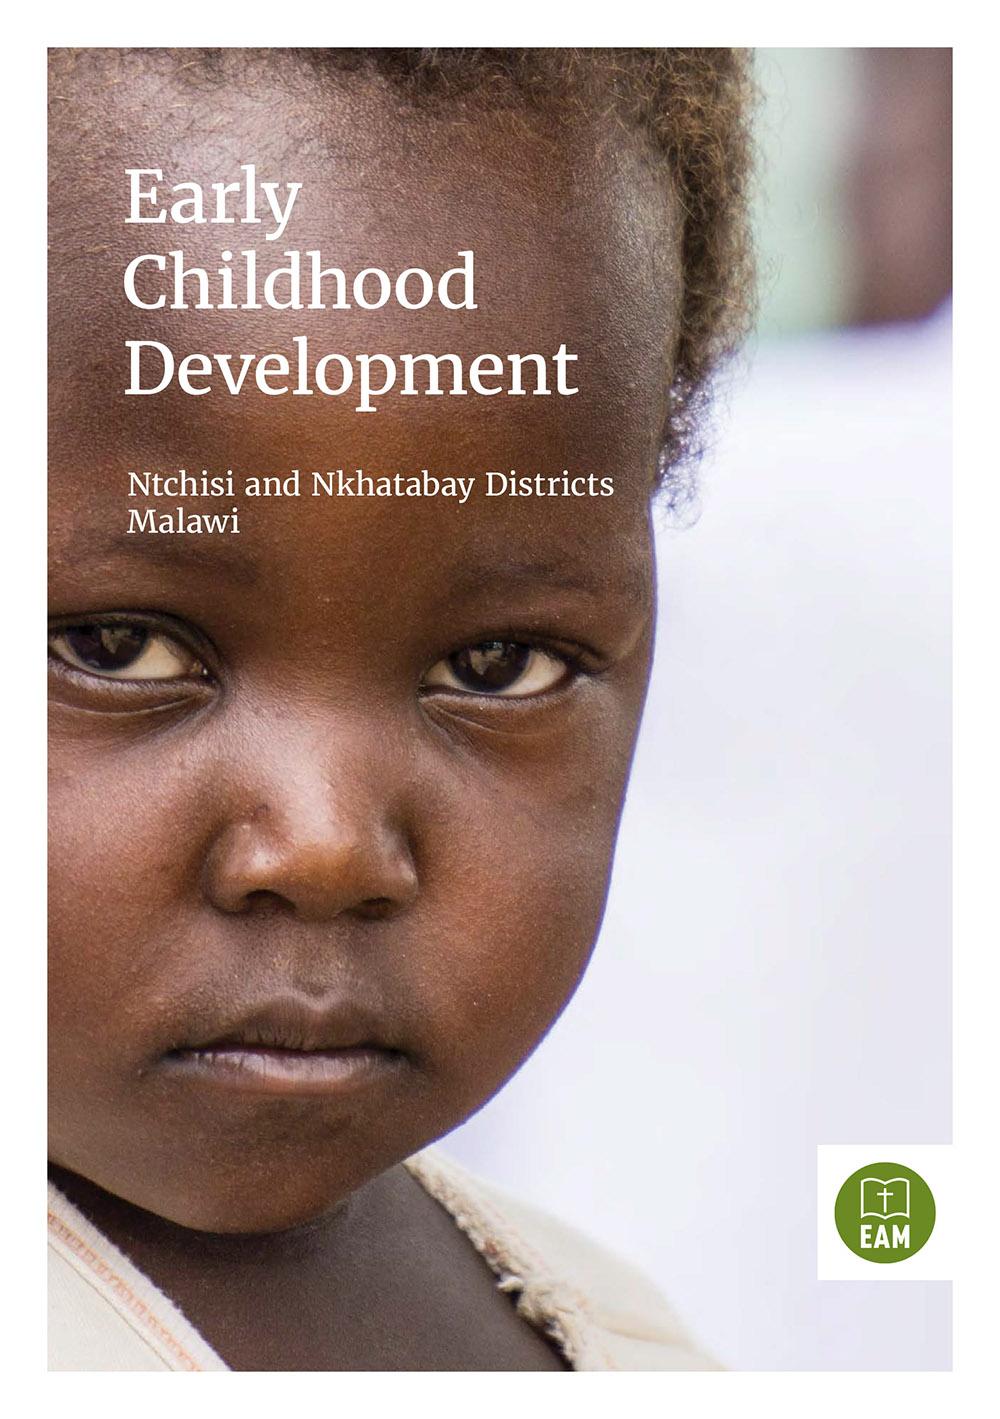 Child development program